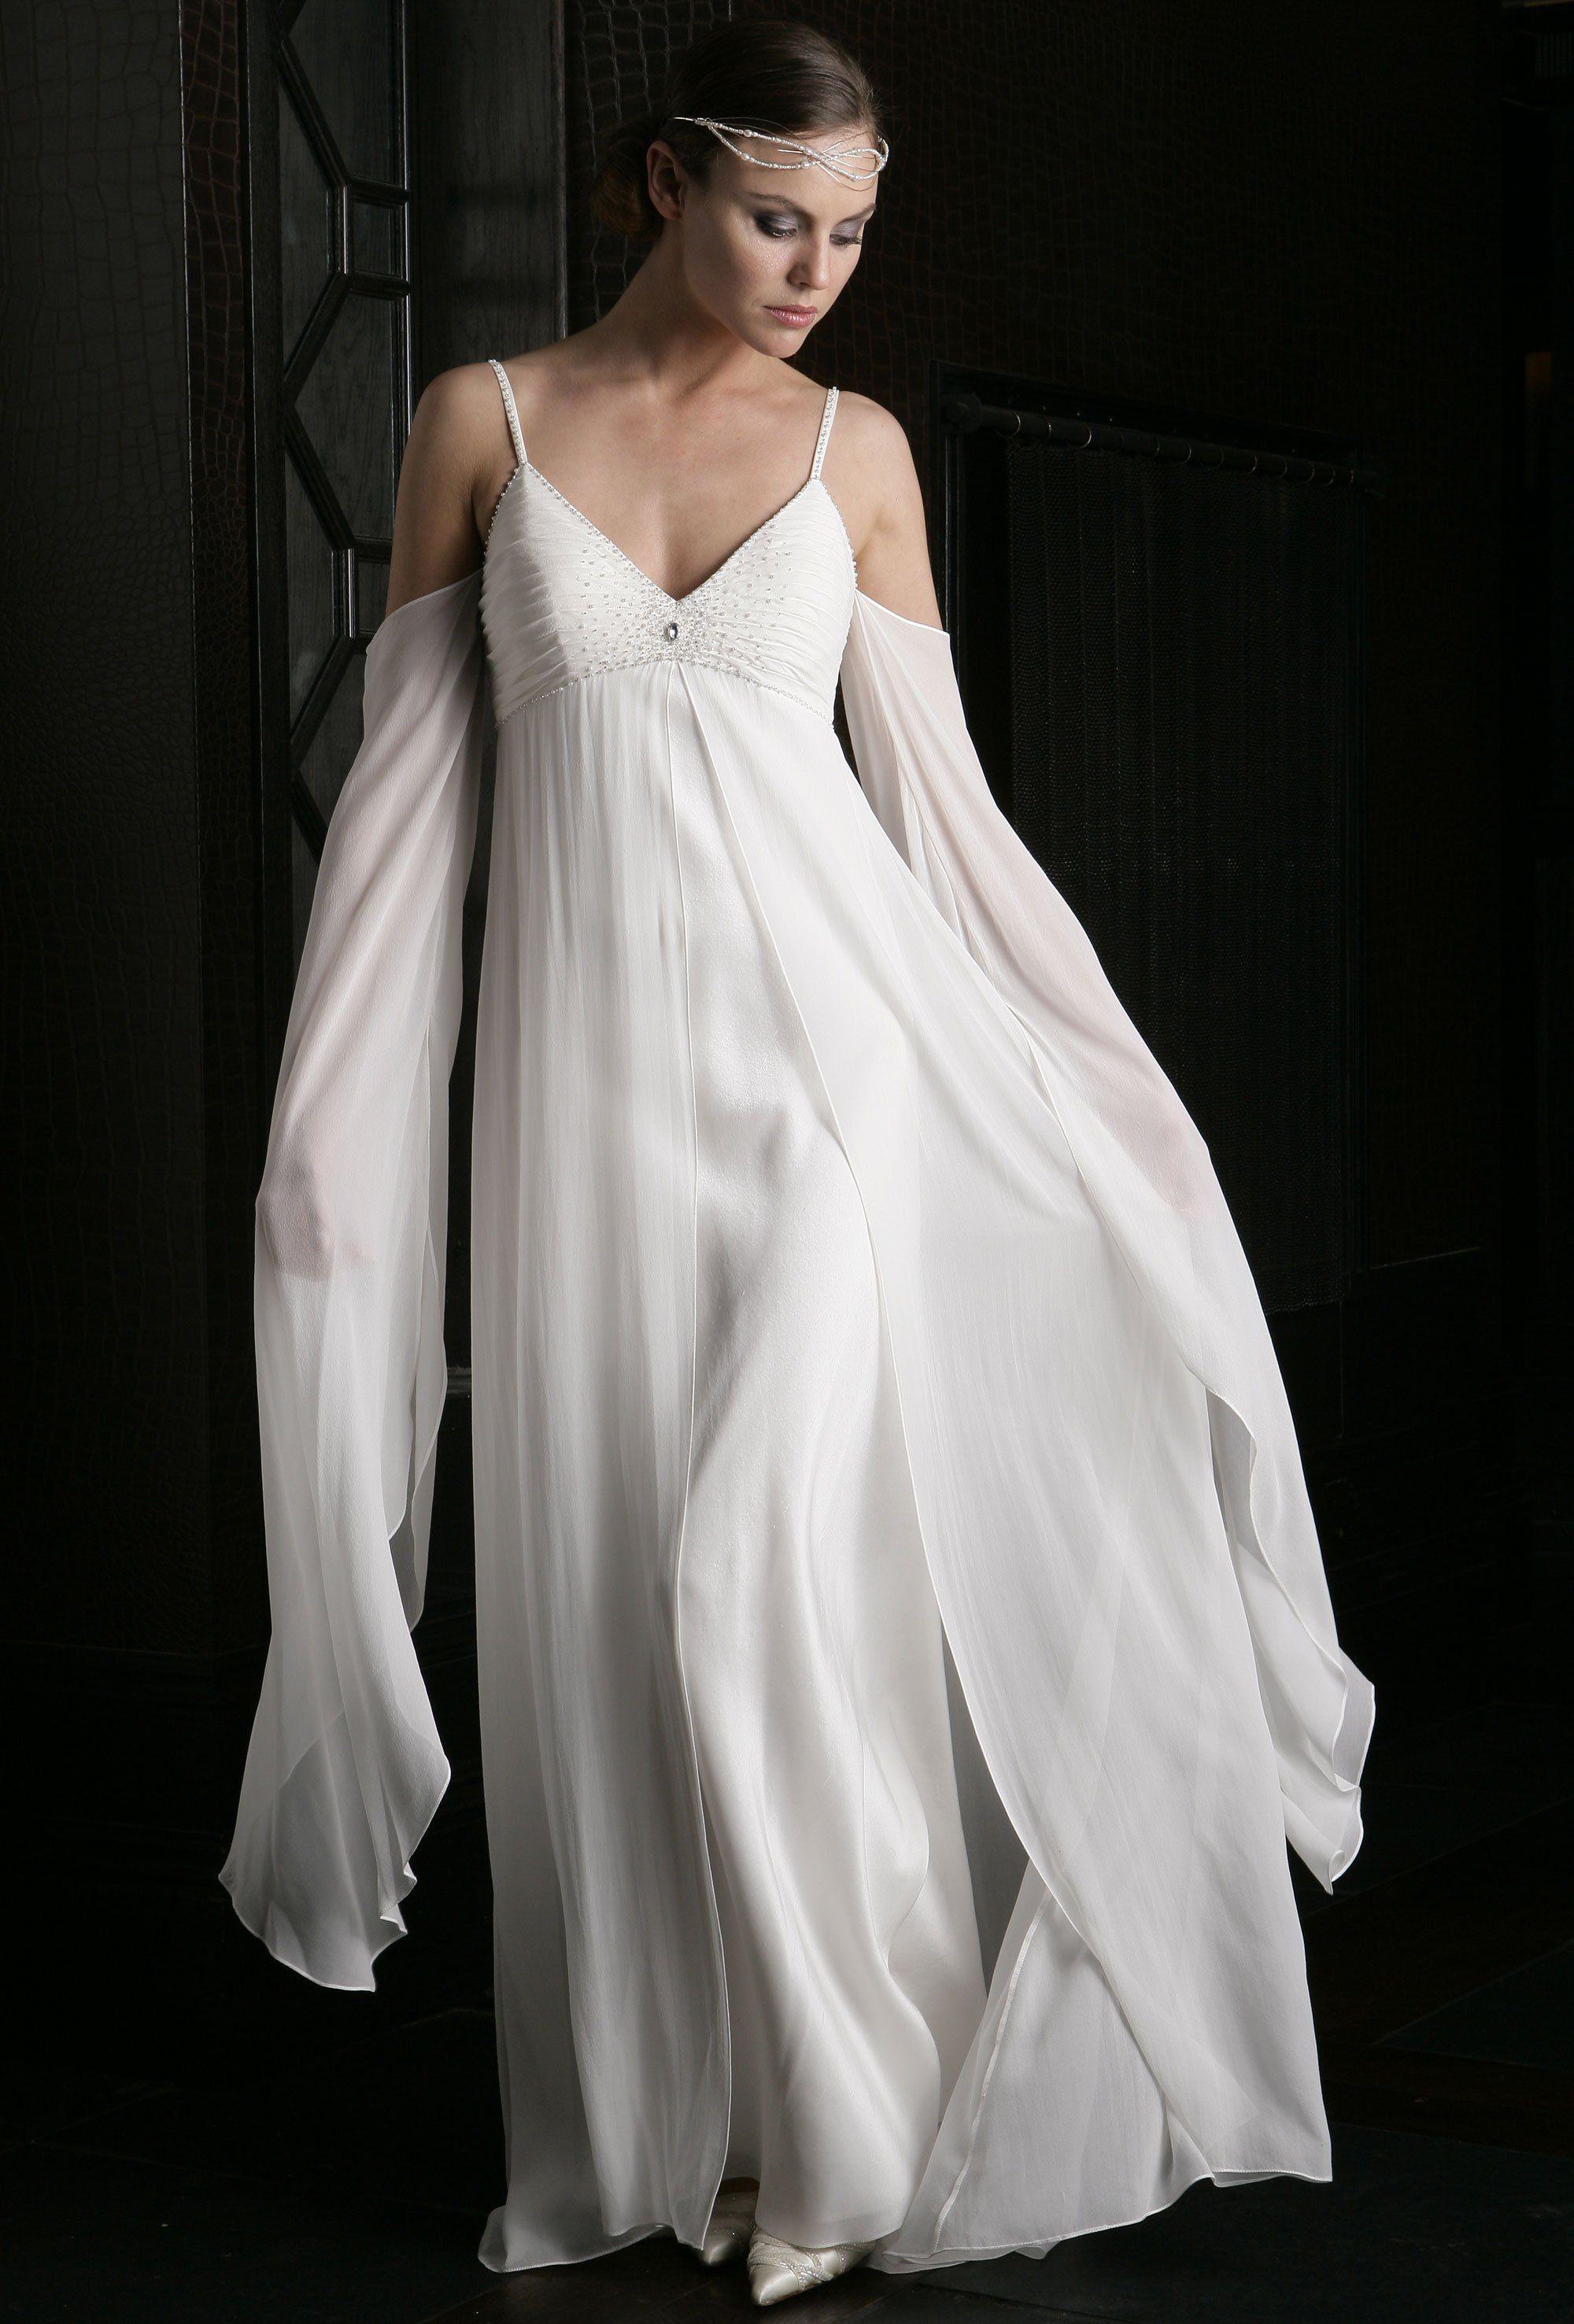 Gabriella Wedding Dress Grecian Or Medieval Maiden A Very Romantic Style In Ivory Silk